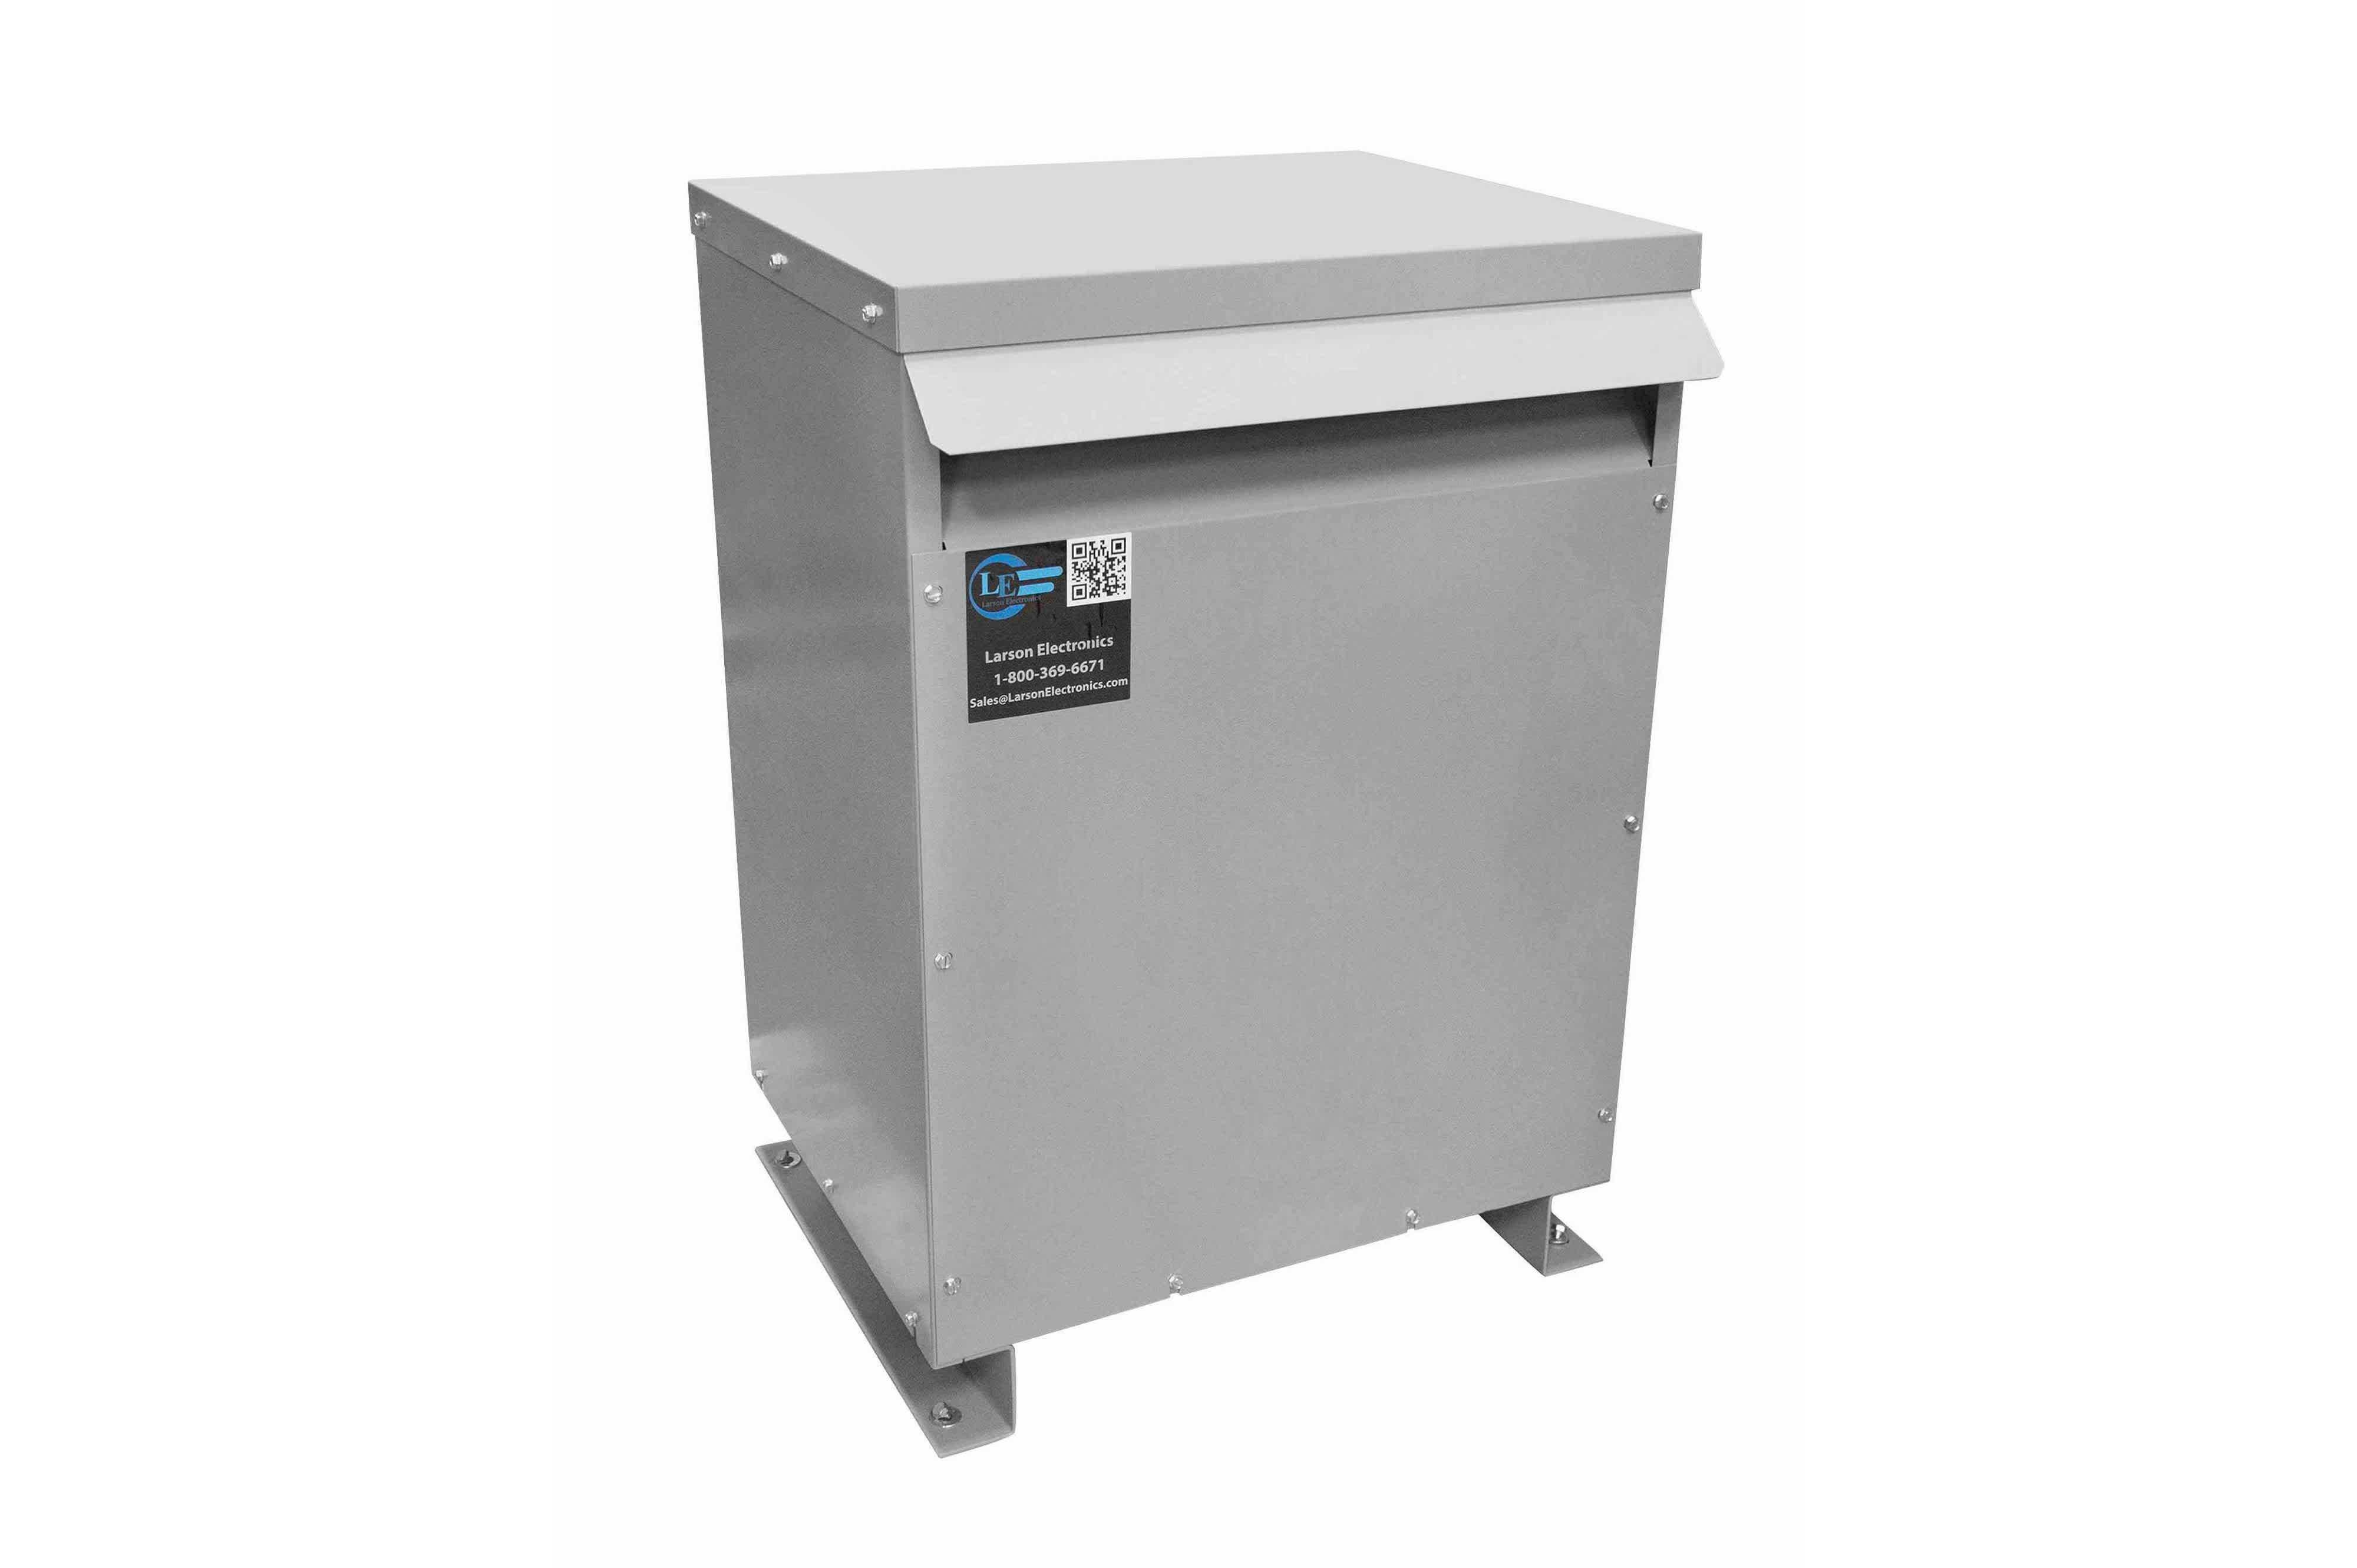 38 kVA 3PH Isolation Transformer, 220V Wye Primary, 208V Delta Secondary, N3R, Ventilated, 60 Hz